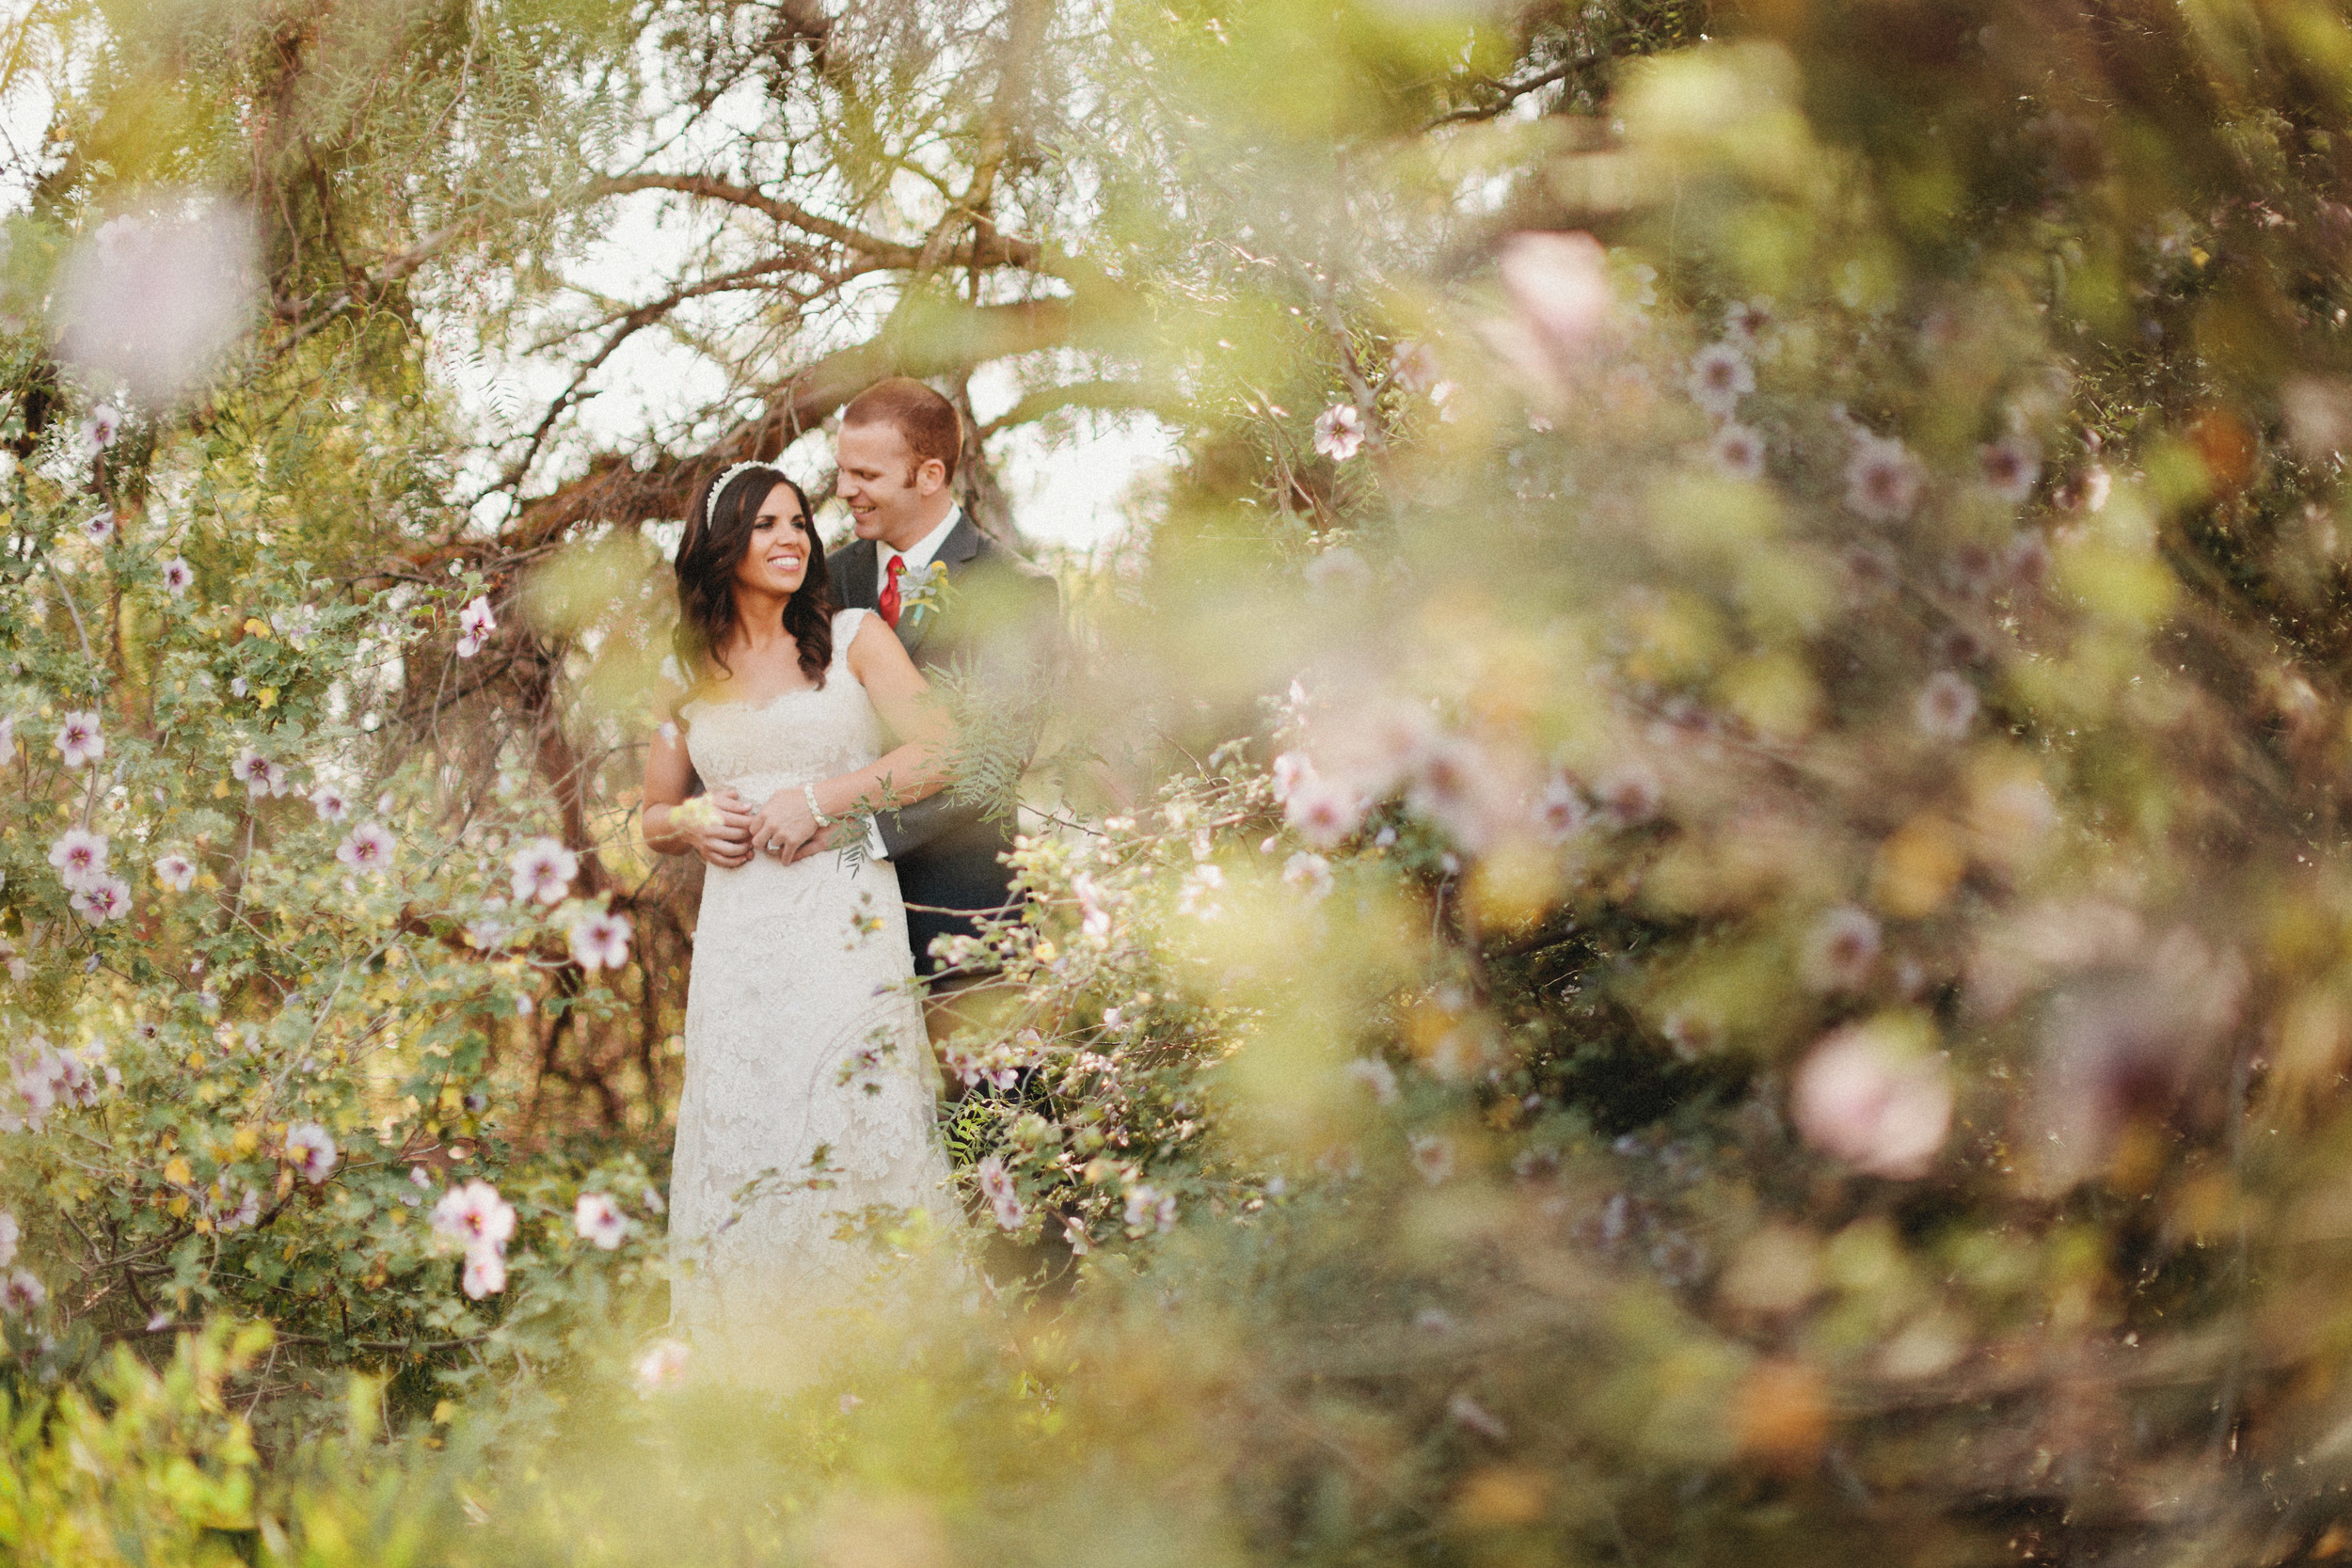 Dr-Suess-wedding-039.jpg